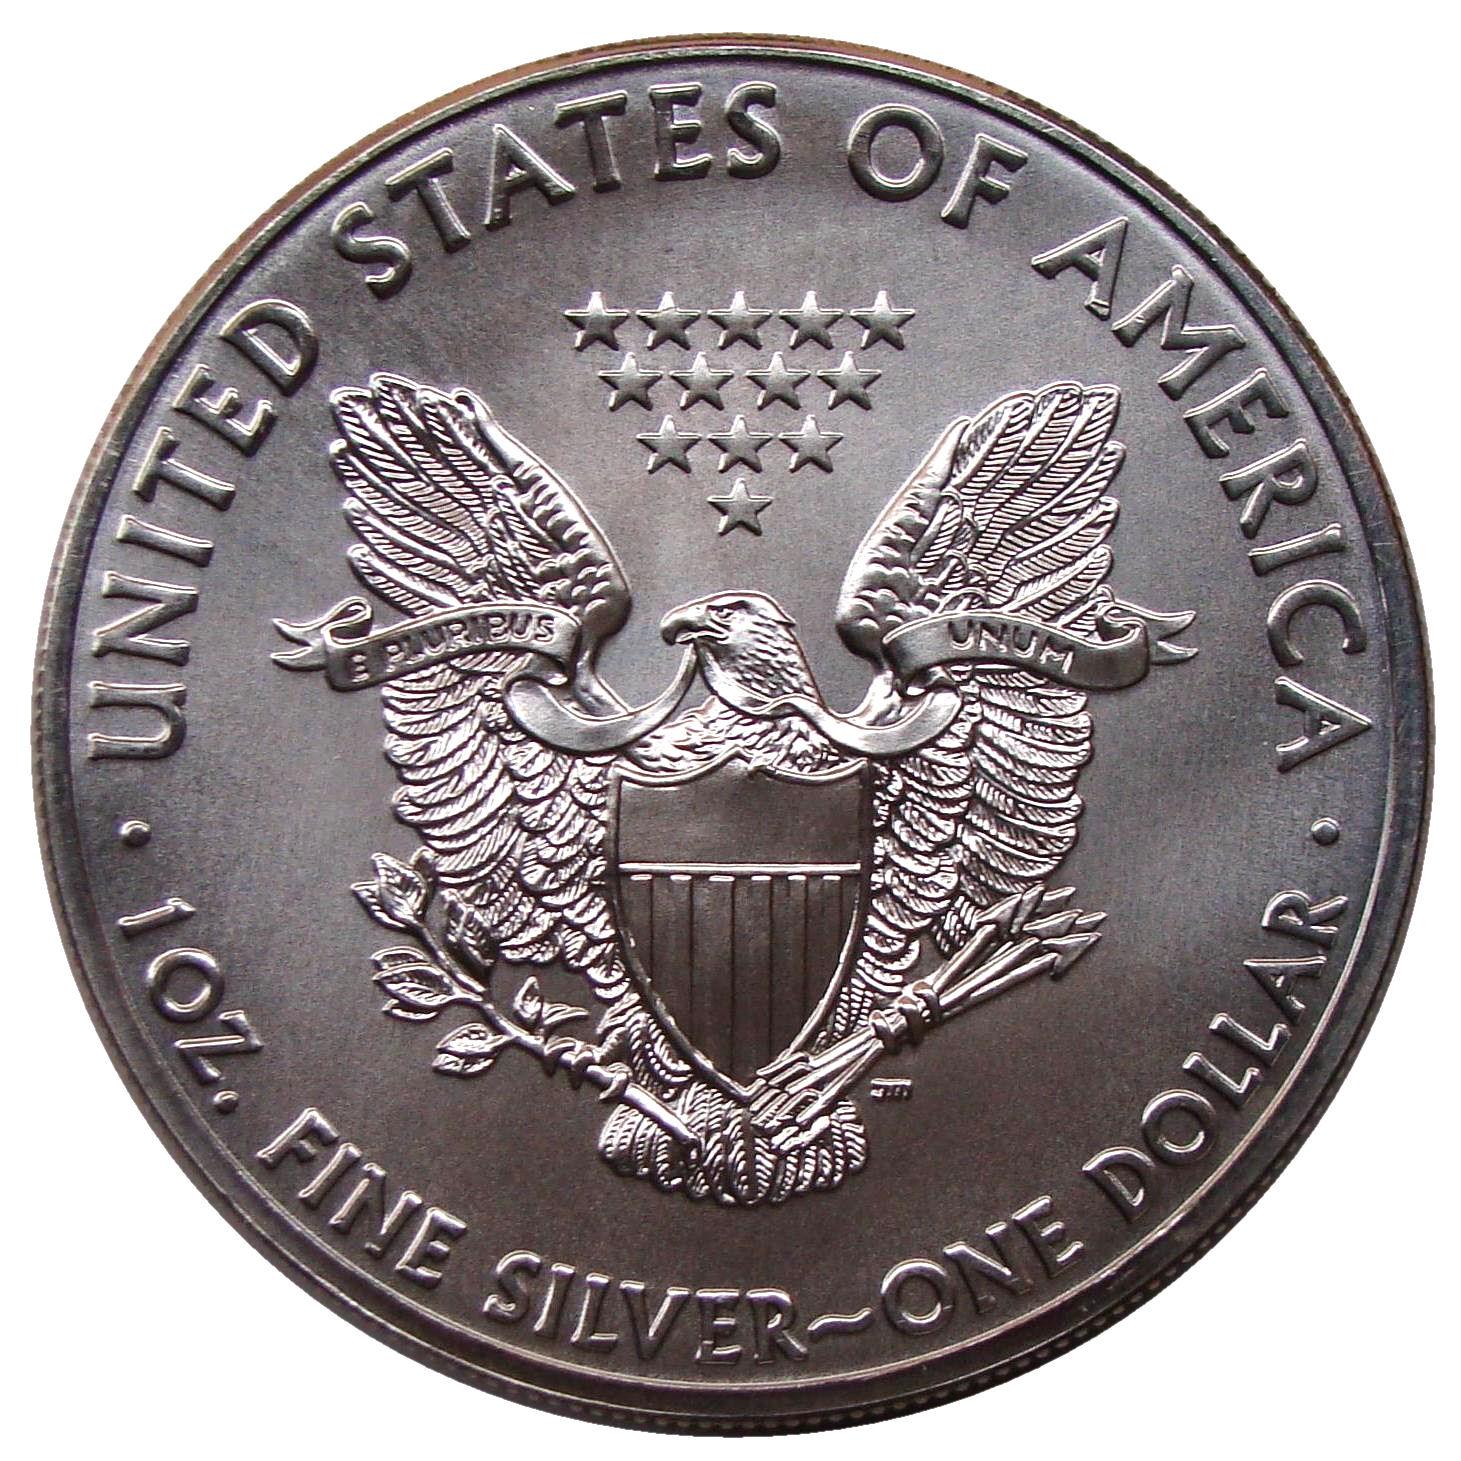 FINE SILVER .999 DOLLAR BULLION COIN 2012 AMERICAN EAGLE WALKING LIBERTY 1 OZ